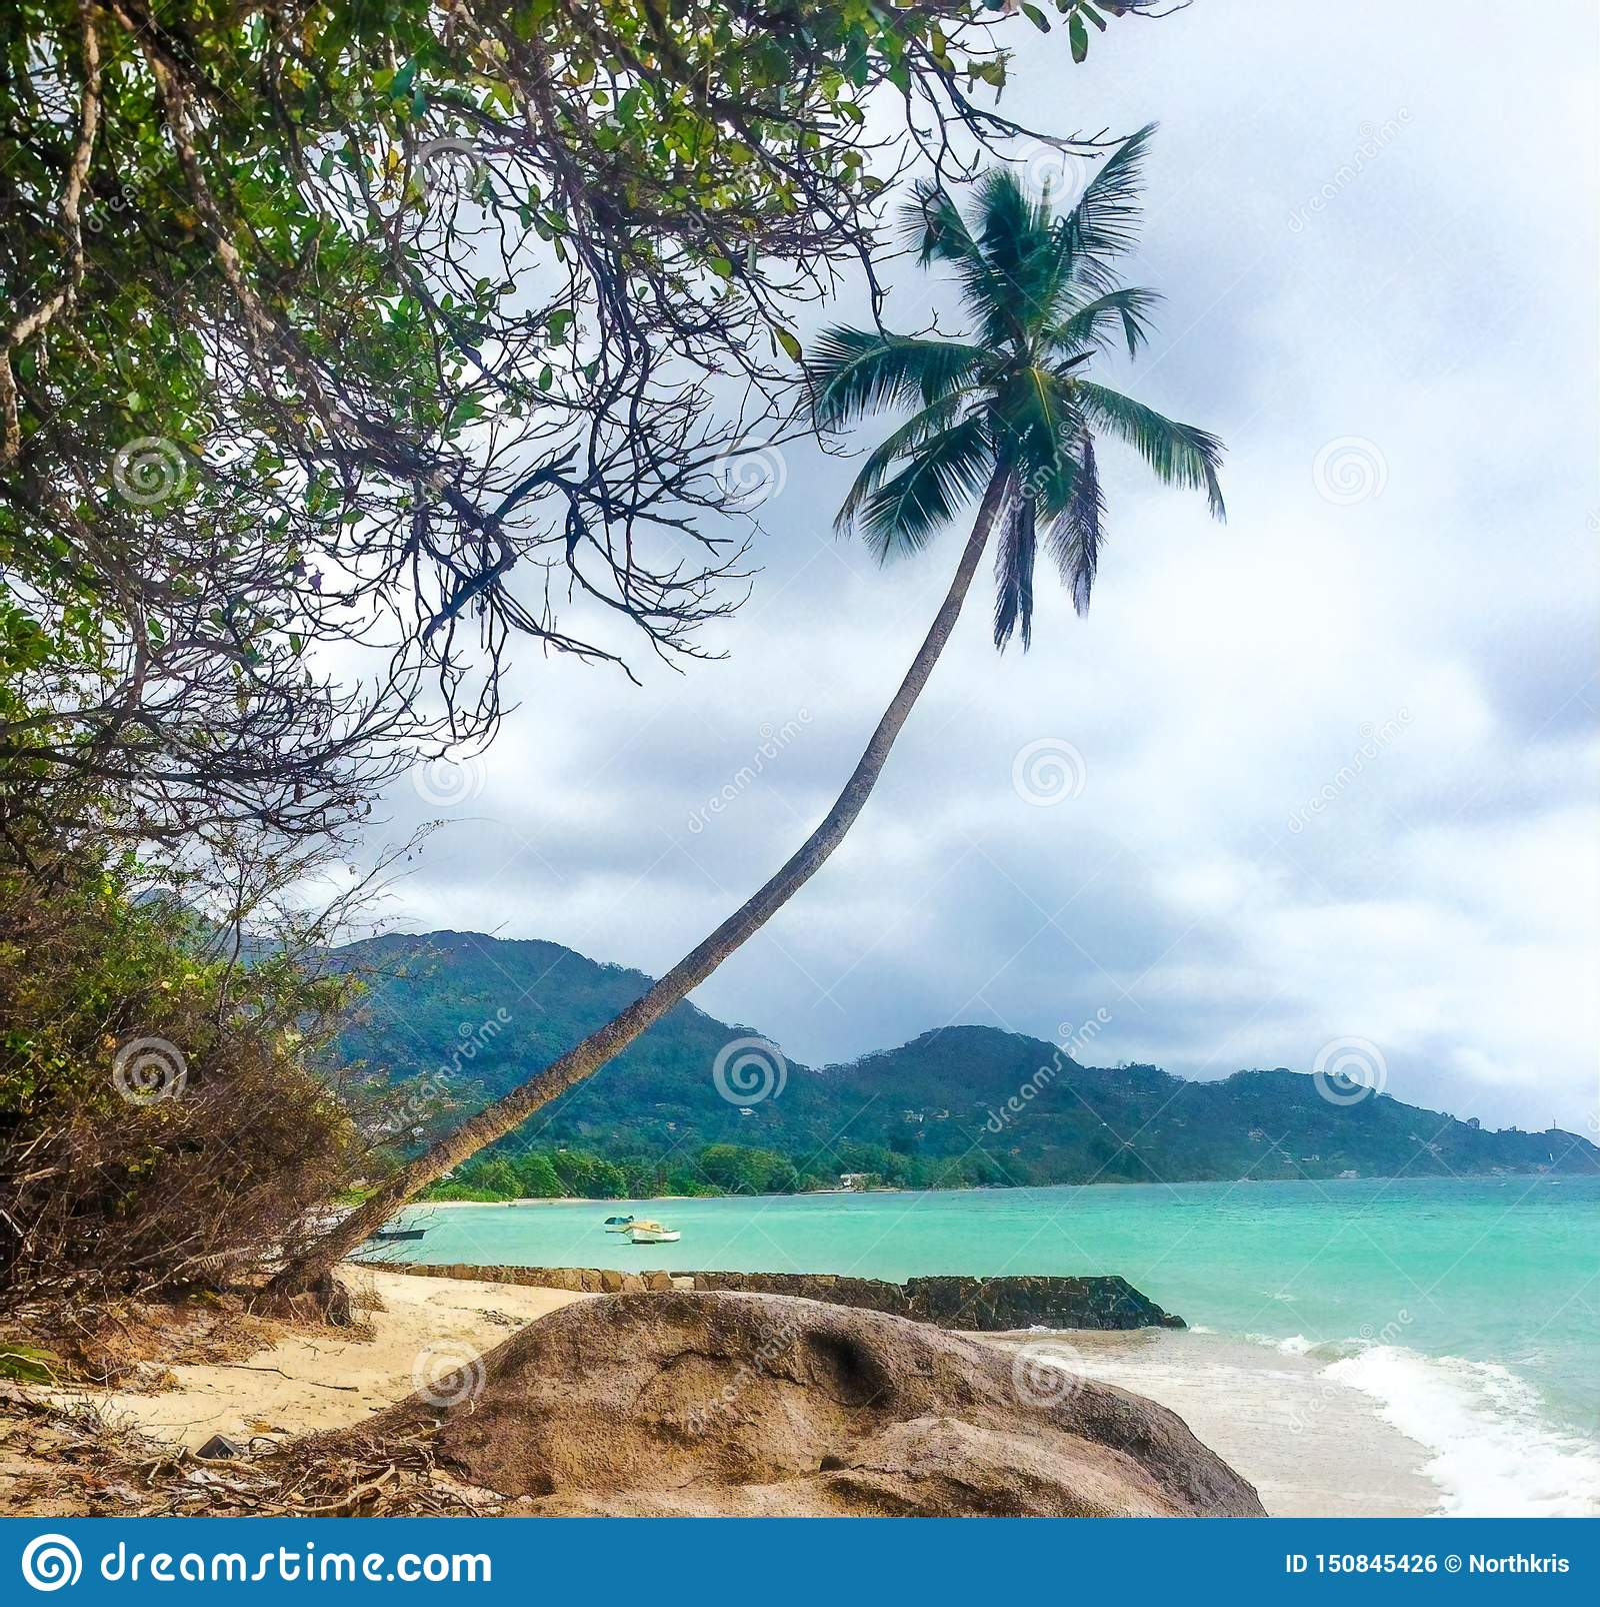 Seychelles Island Beaches: Scenic Beach View, Mahe Island, Seychelles Stock Photo